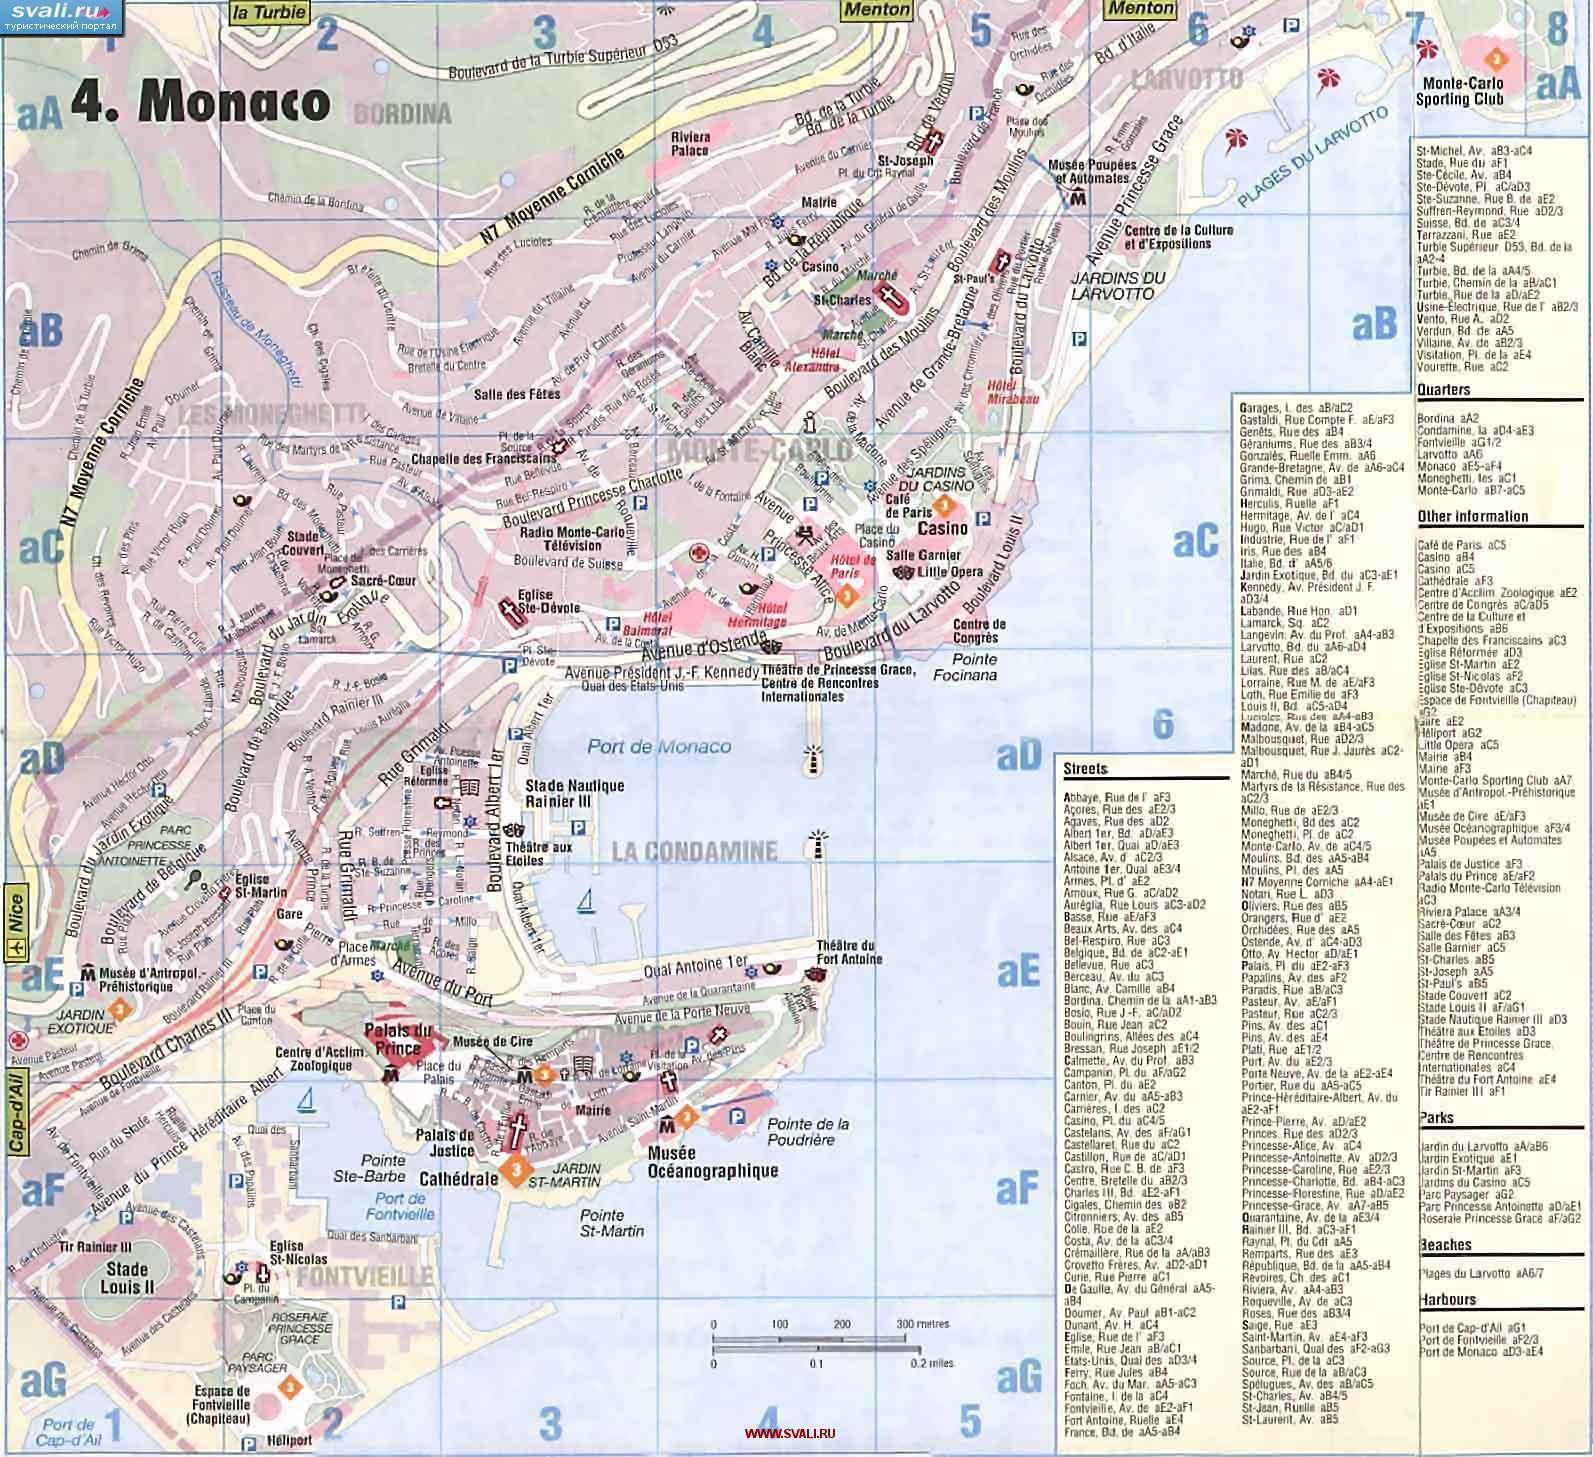 Karta Monako Na Russkom Yazyke Monako Na Karte Mira Webmandry Com